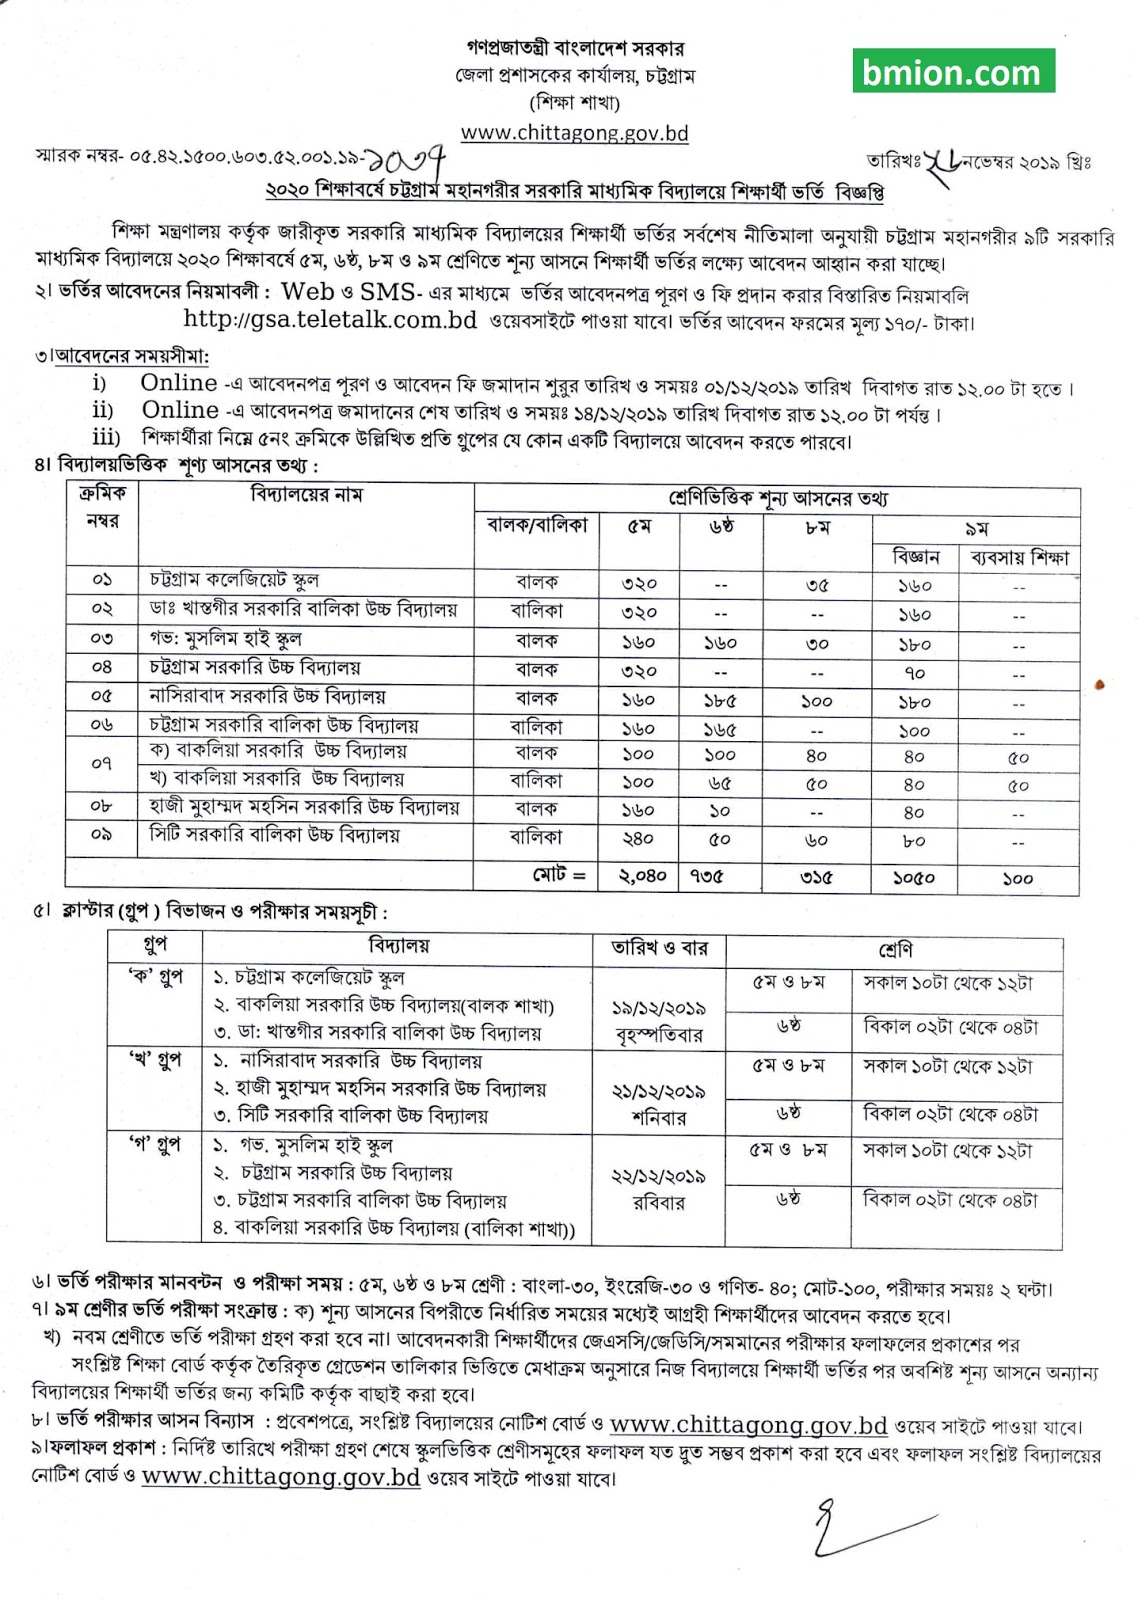 Chattogram-Govt-School-Admission-2020